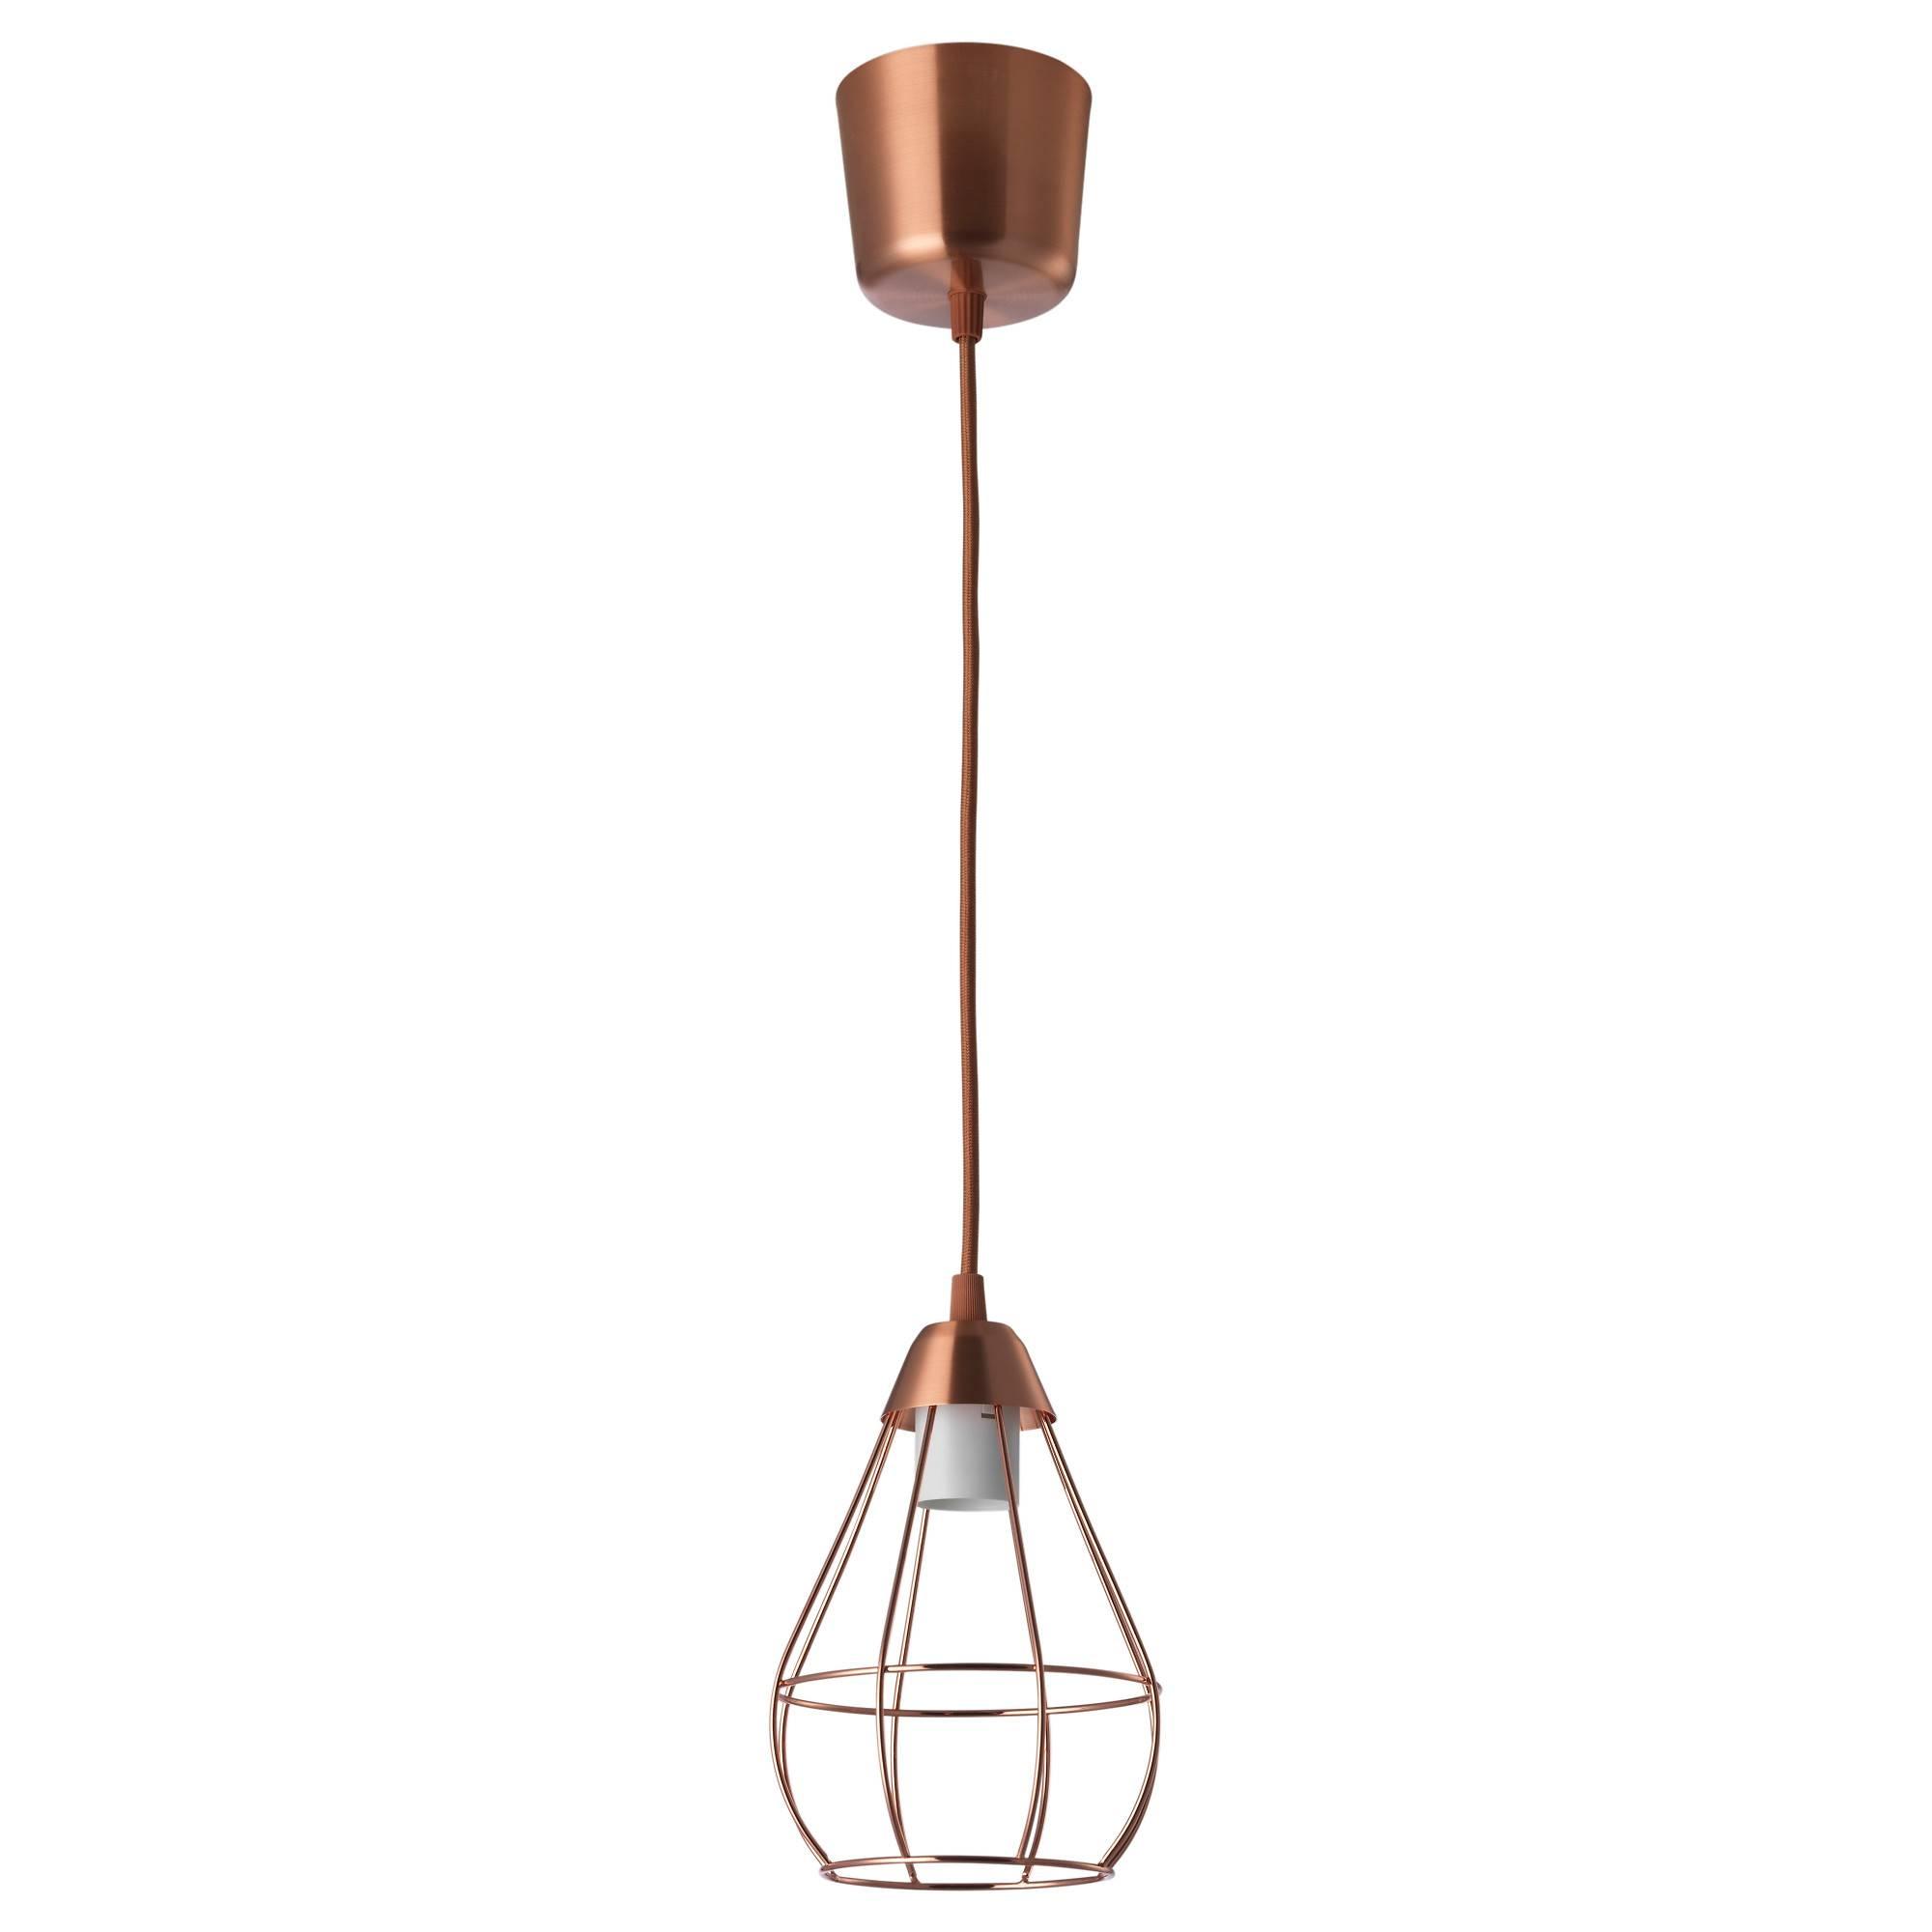 Slättbo Pendant Lamp Copper-Colour 14.5 Cm - Ikea within Corded Pendant Lights (Image 12 of 15)